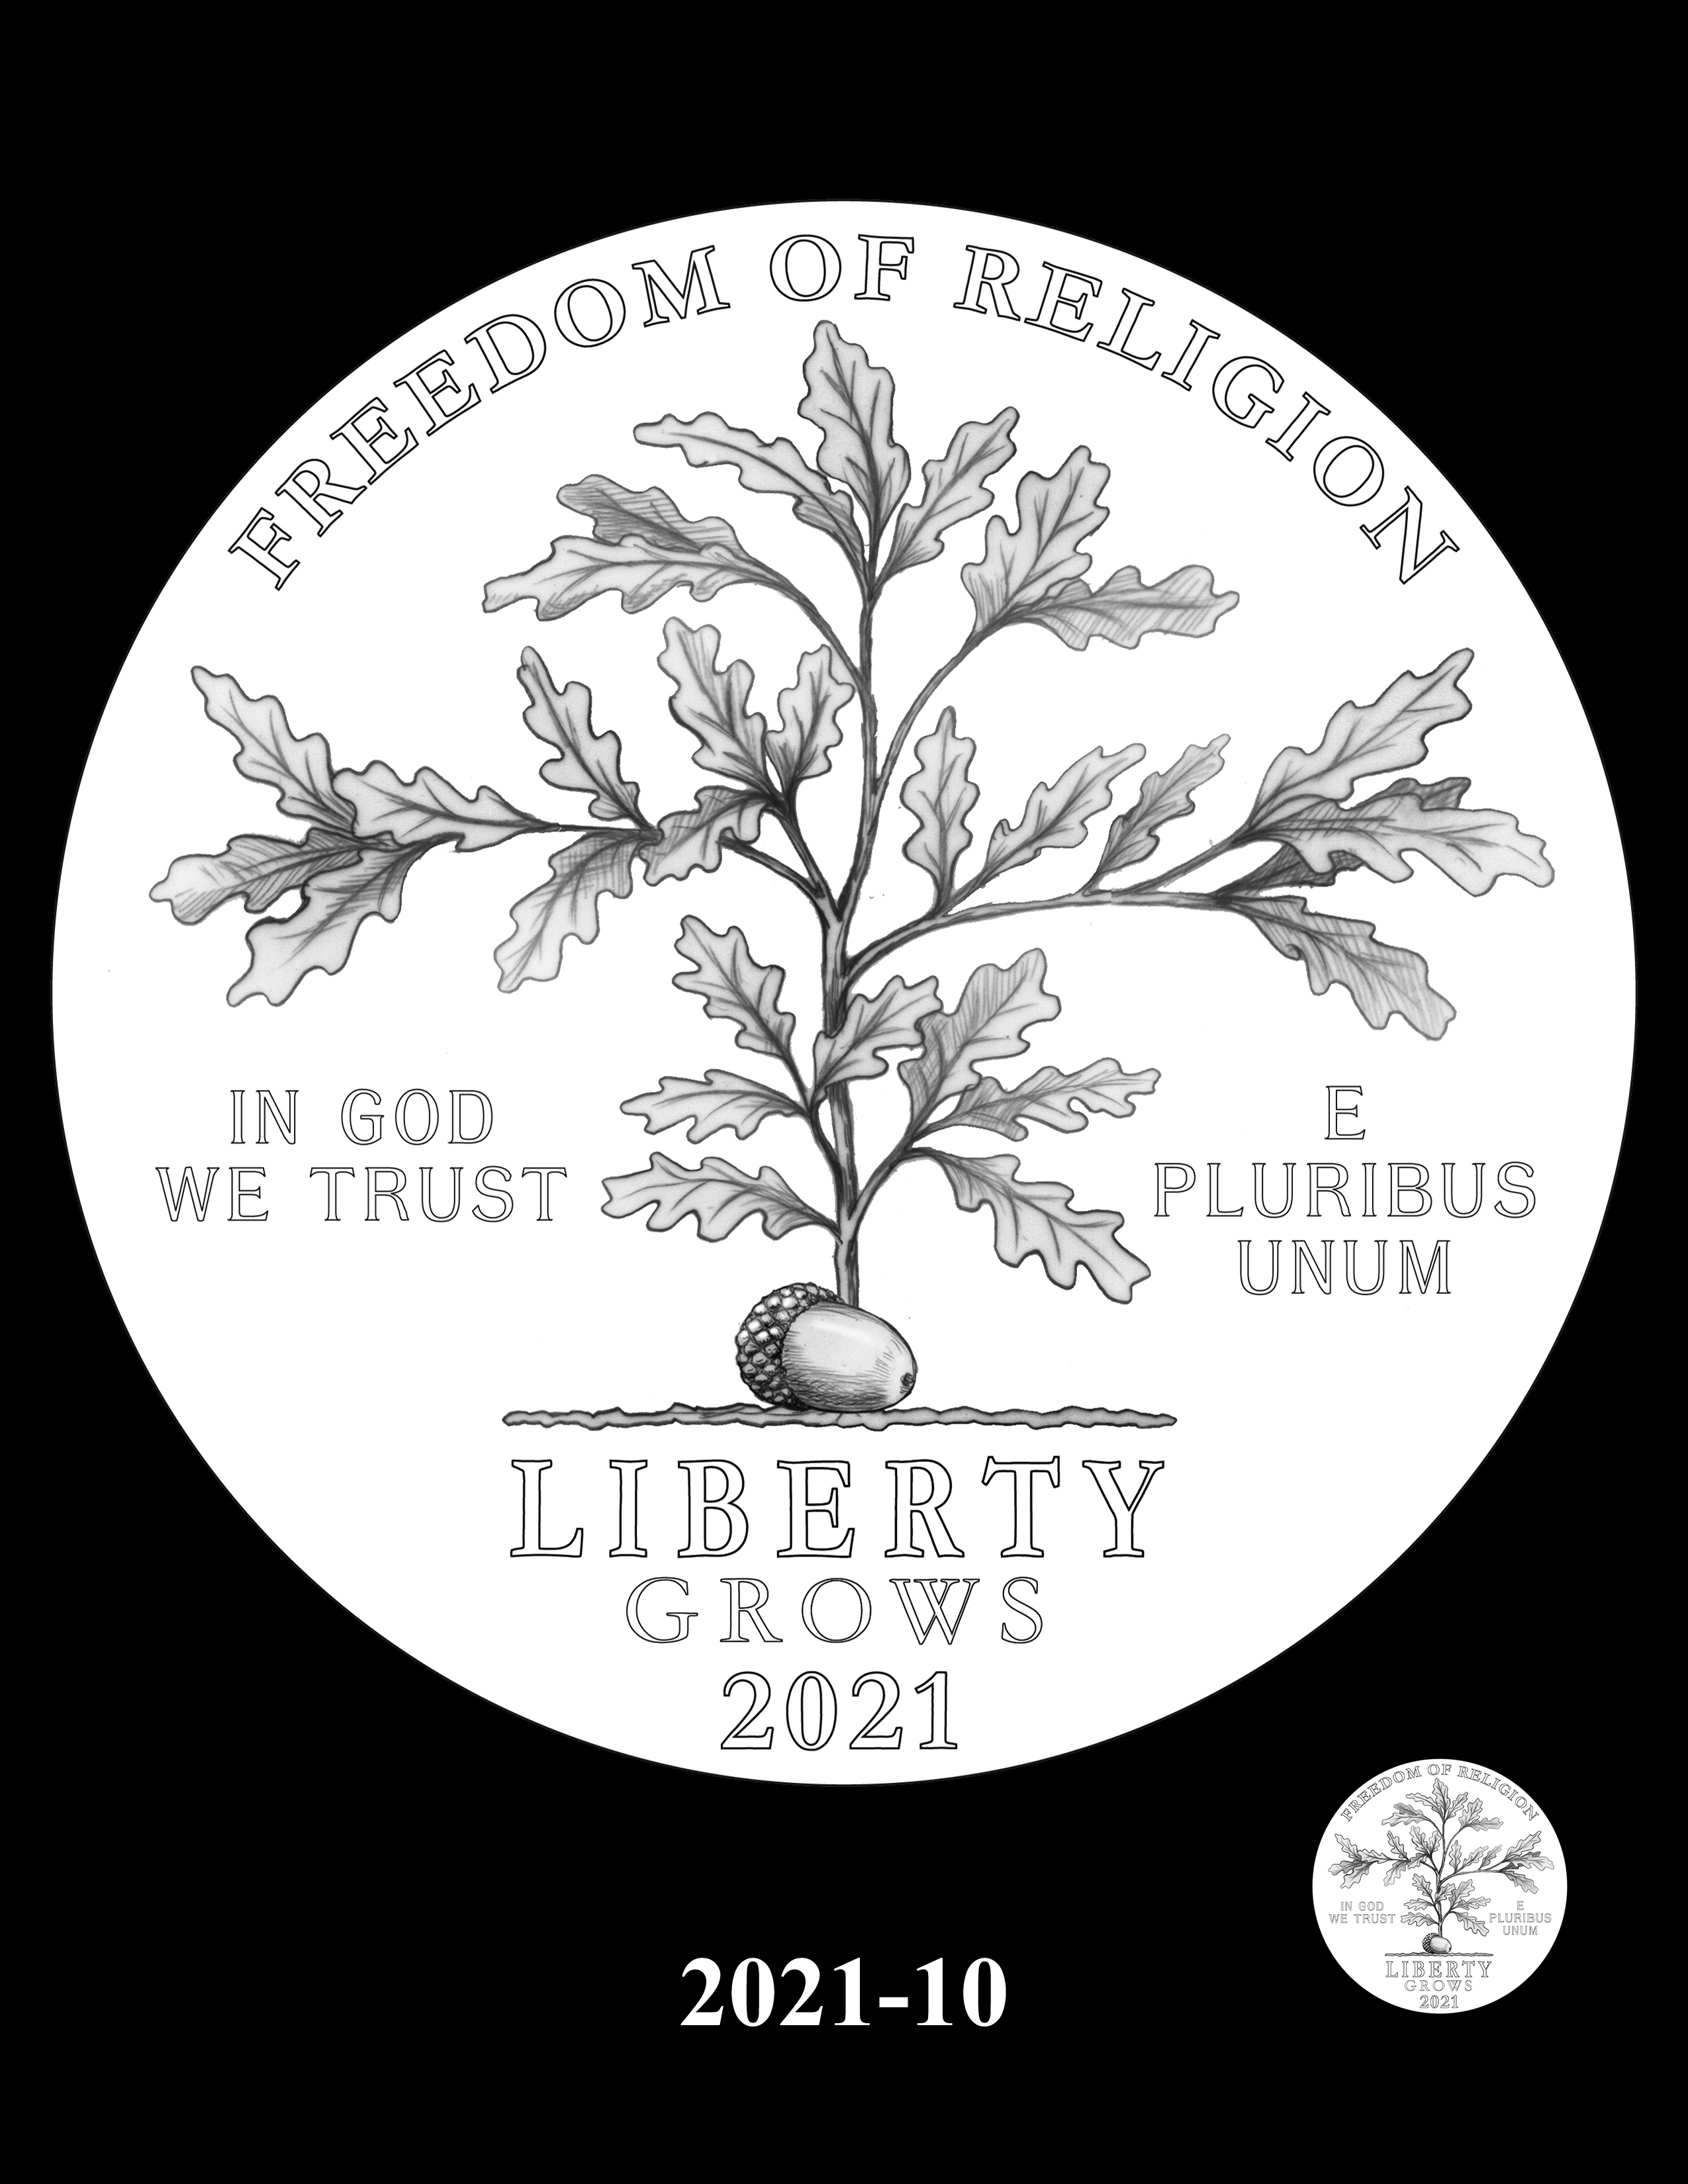 10-2021 -- 2021 - 2025 American Eagle Platinum Proof Program